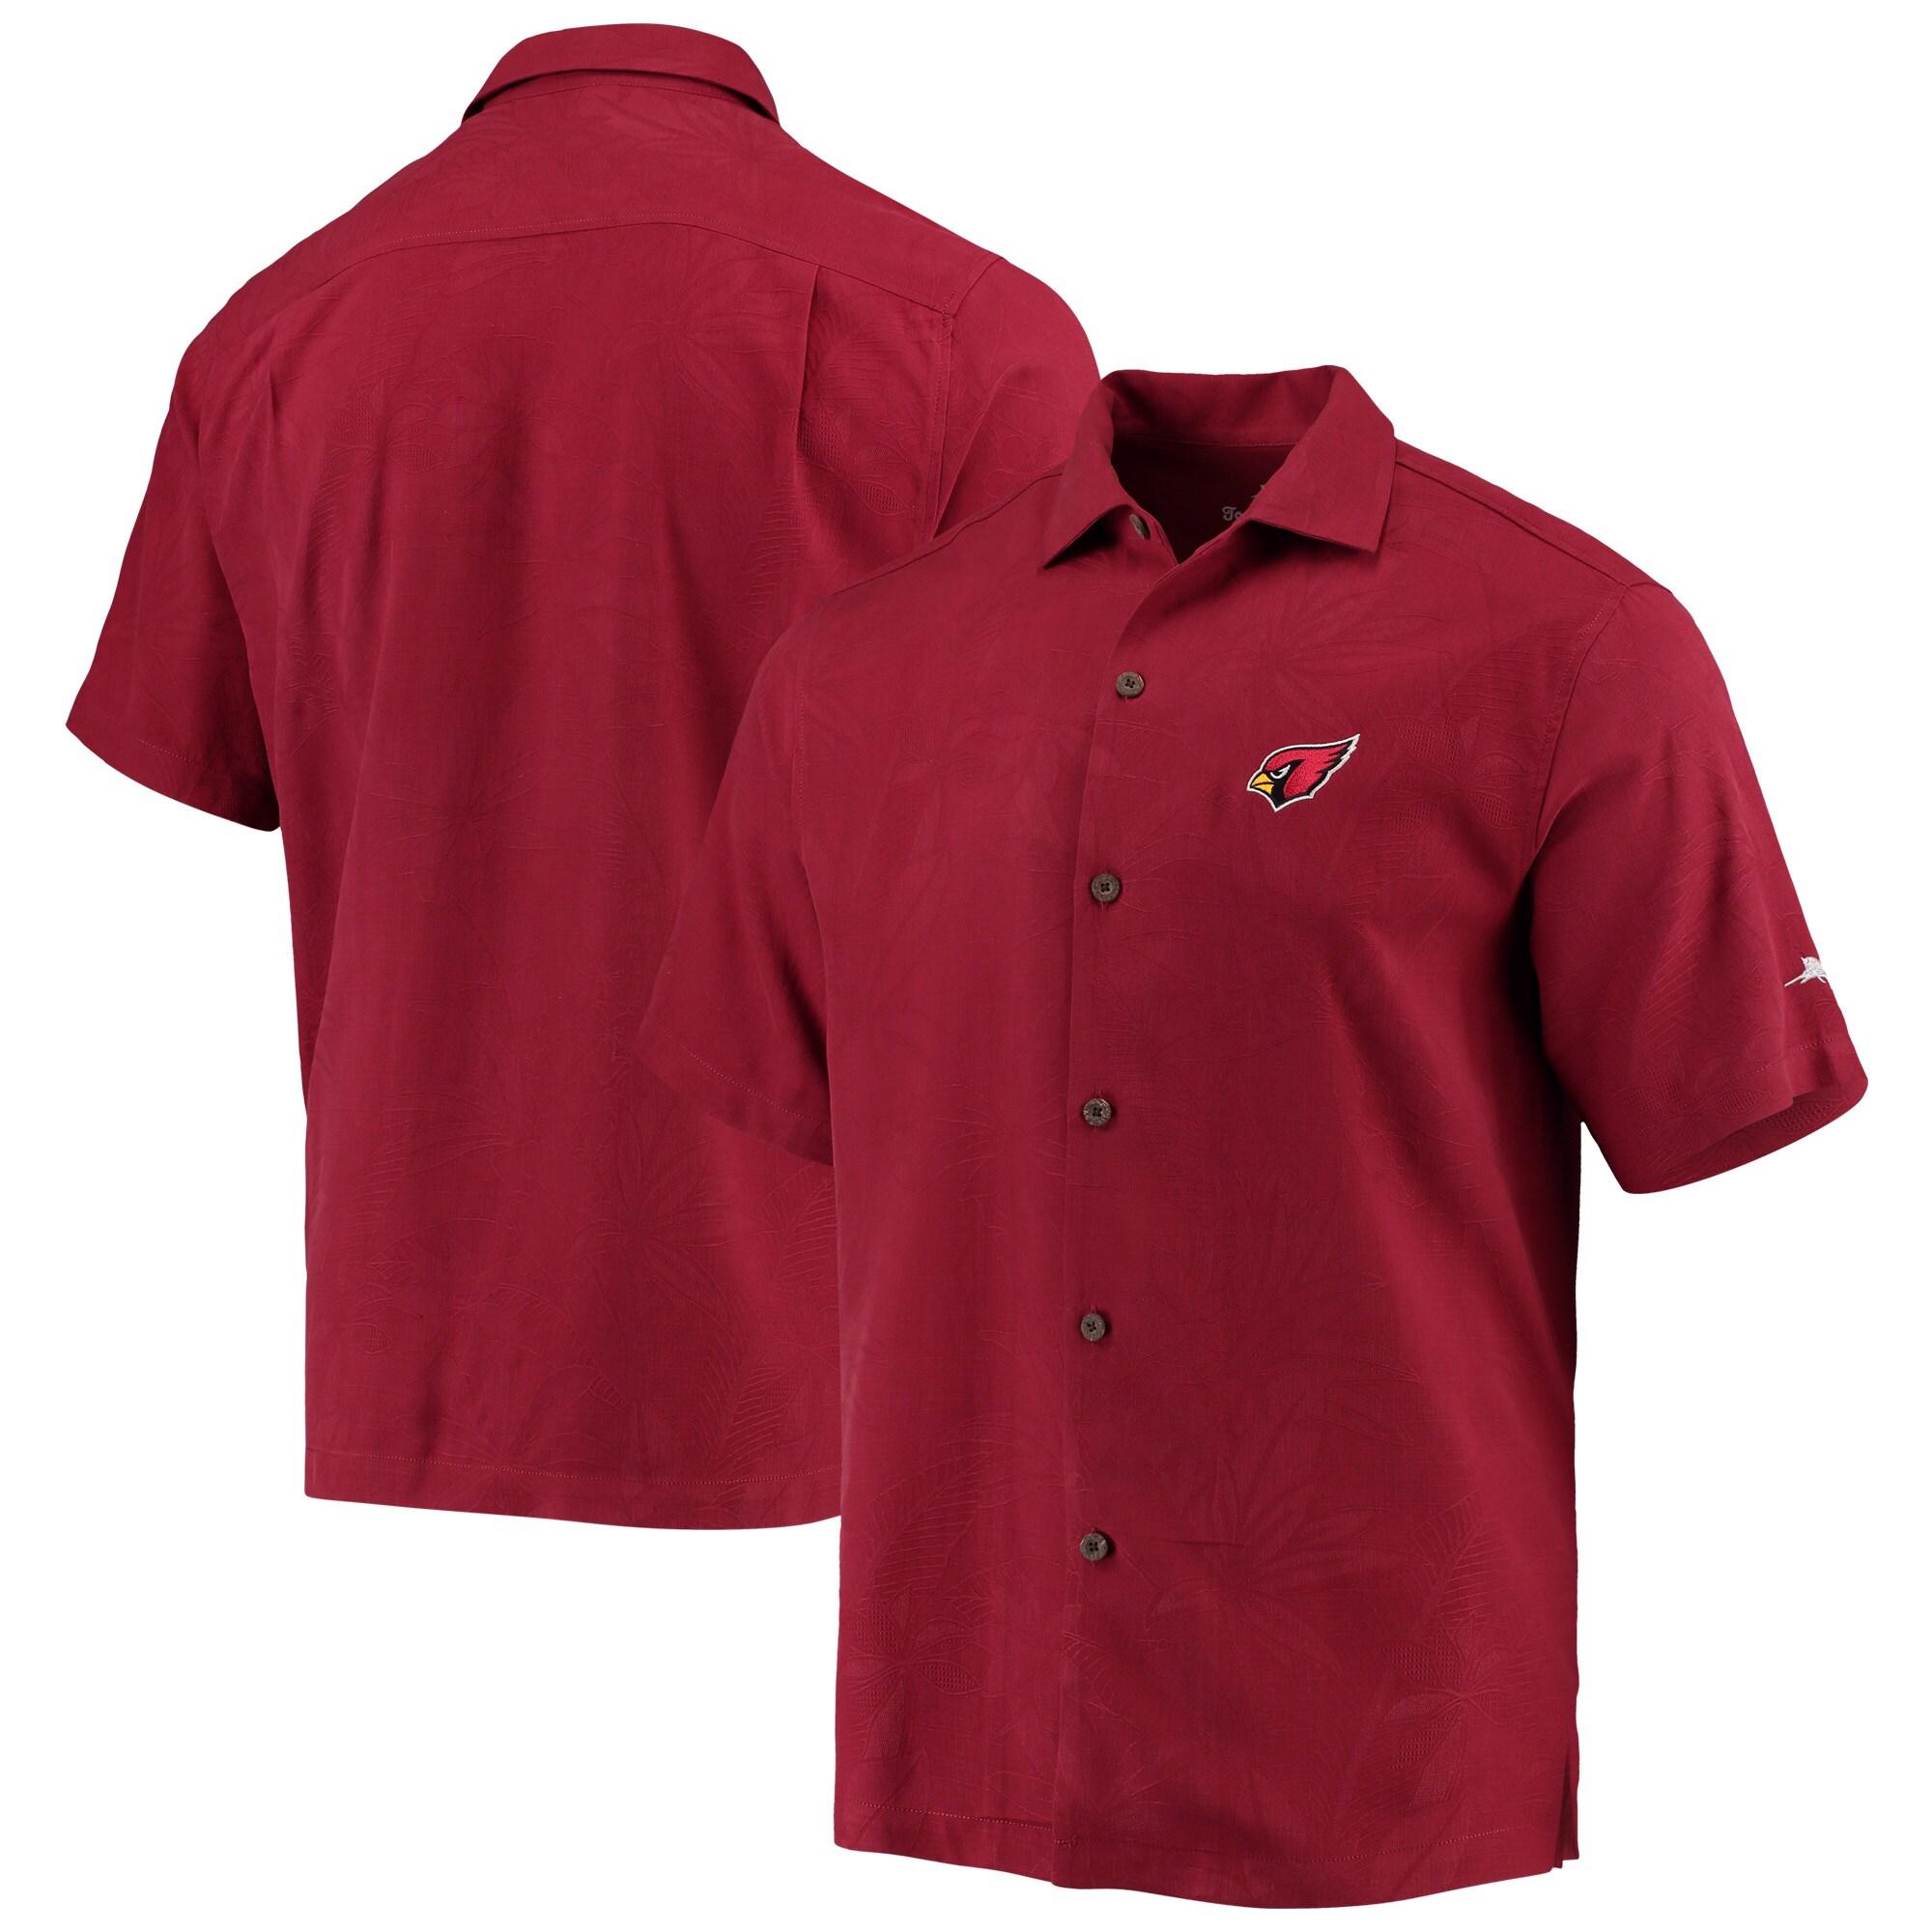 Arizona Cardinals Tommy Bahama Al Fresco Tropics Jacquard Woven Button-Down Shirt - Cardinal